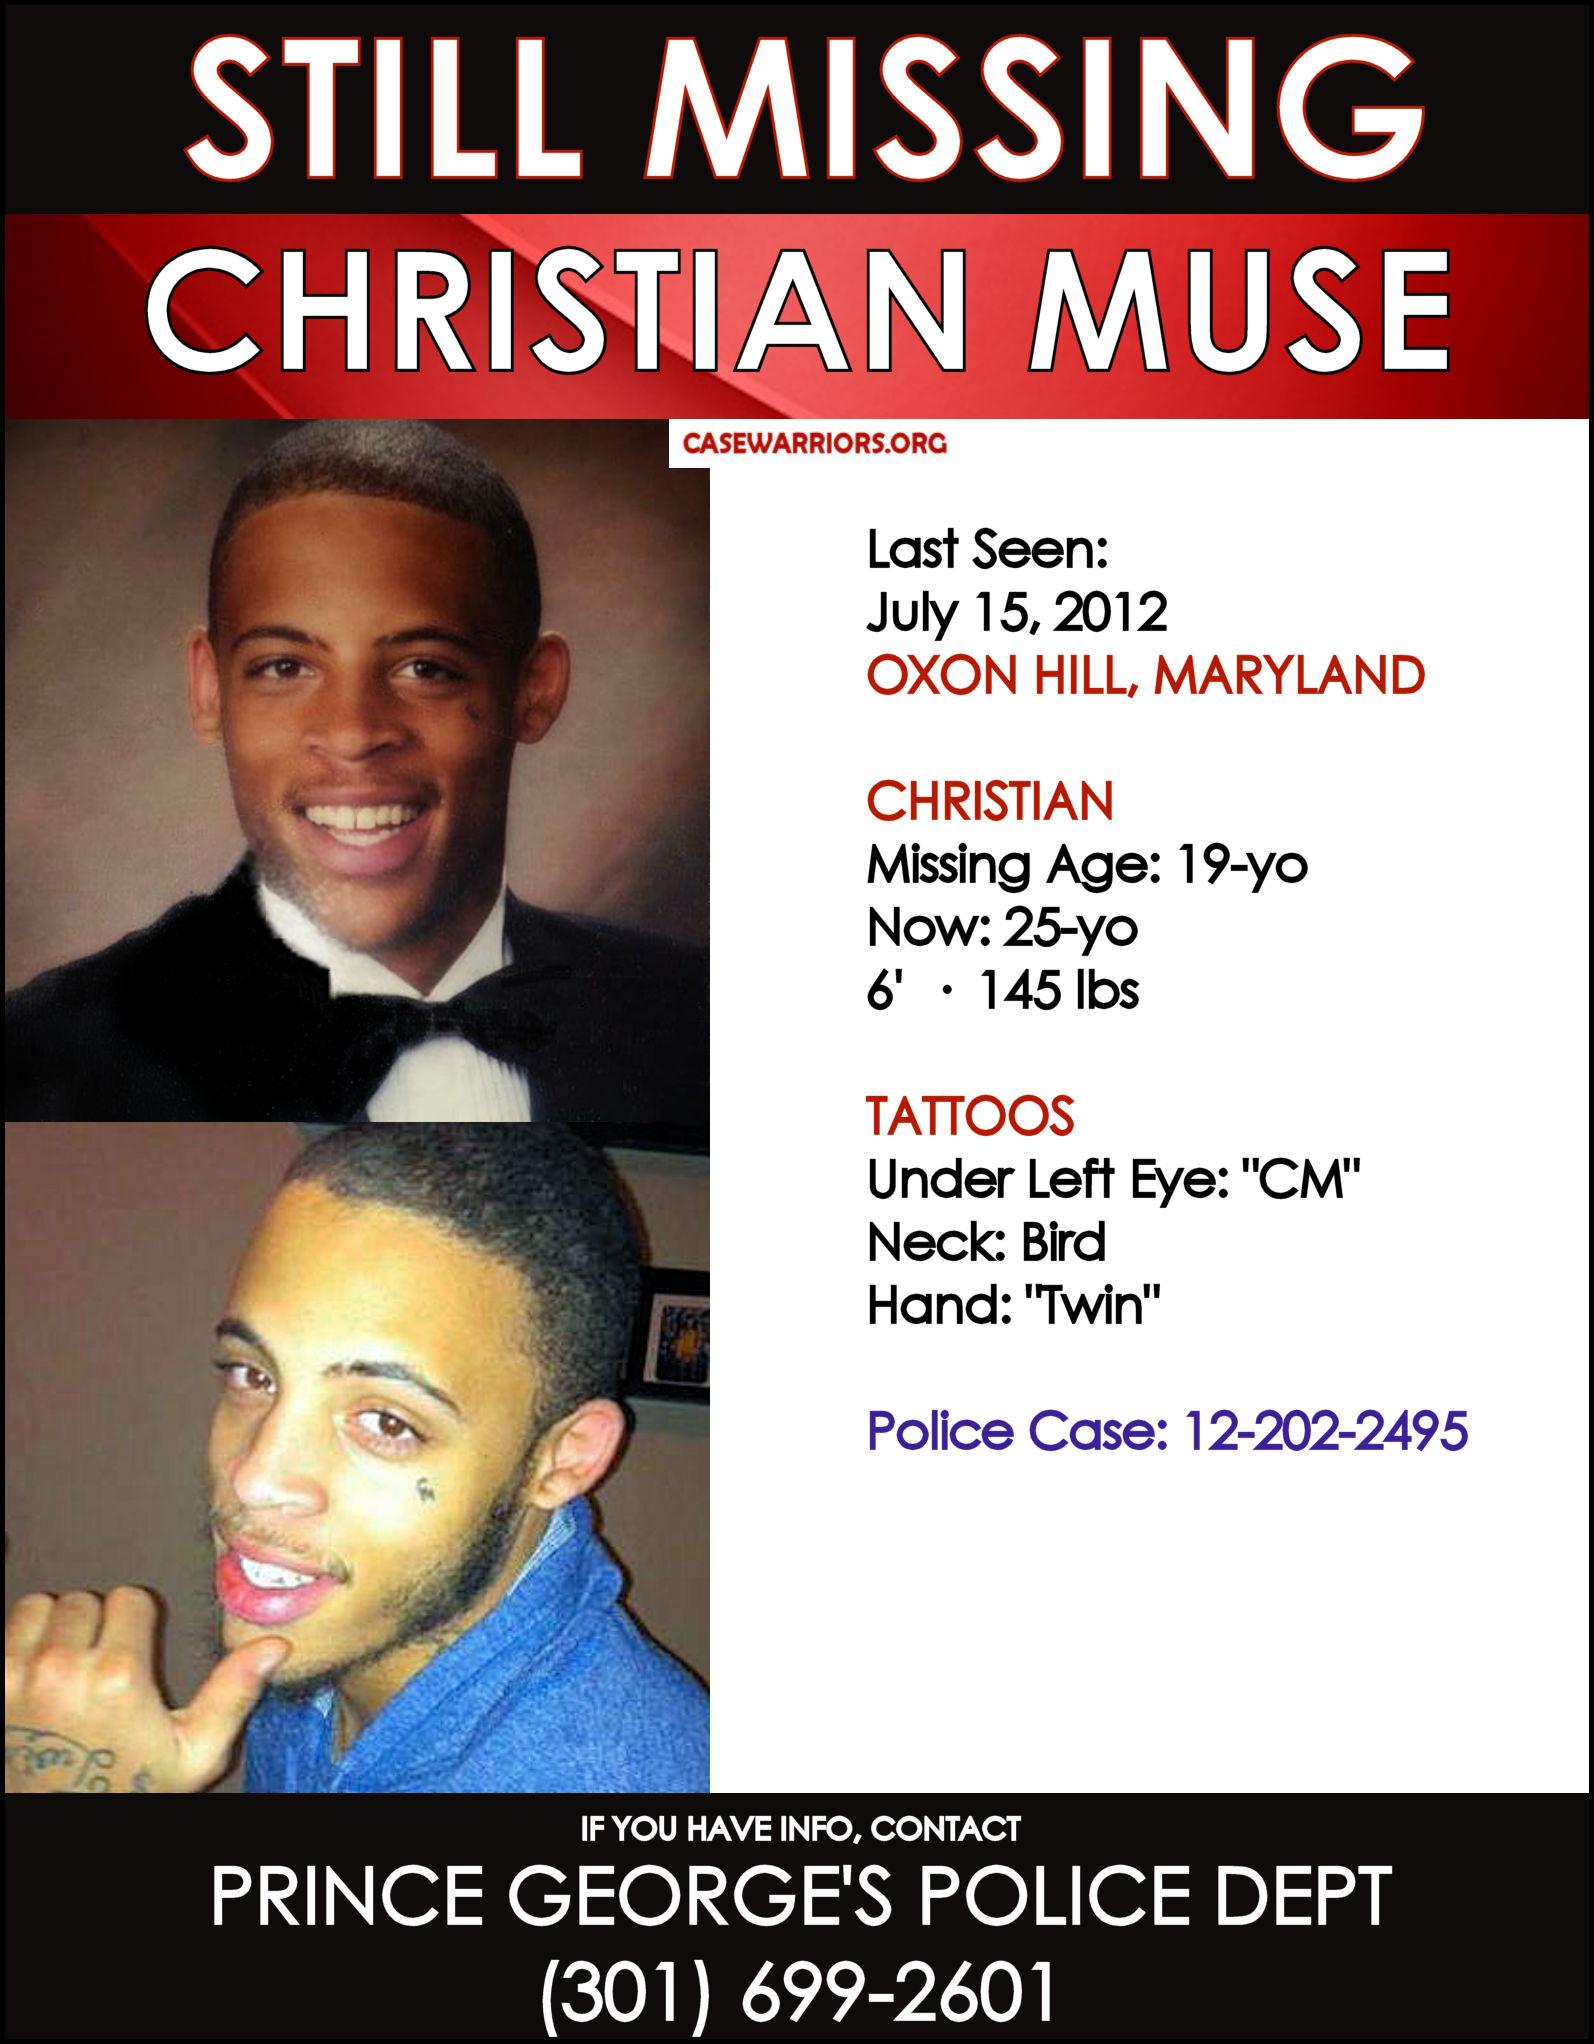 CHRISTIAN MUSE